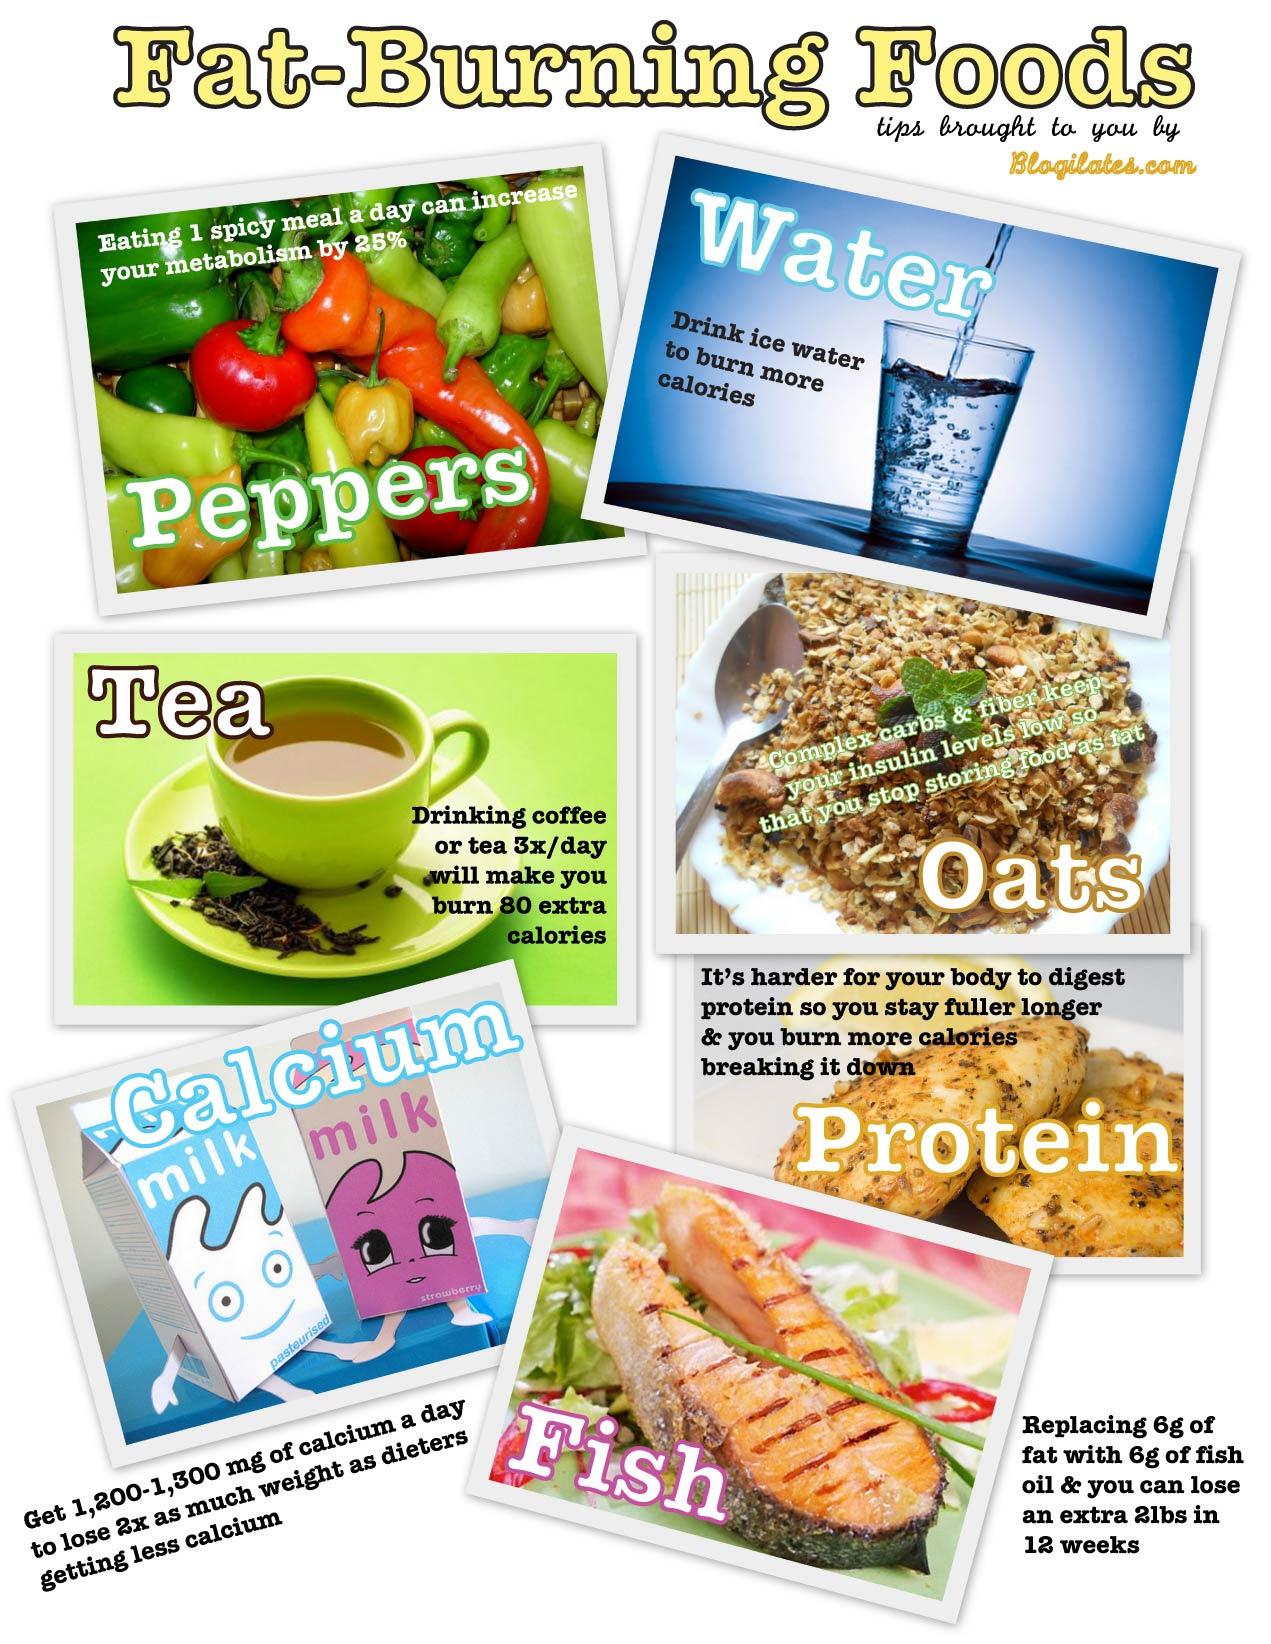 Best Foods for Burning Calories & Boosting Metabolism